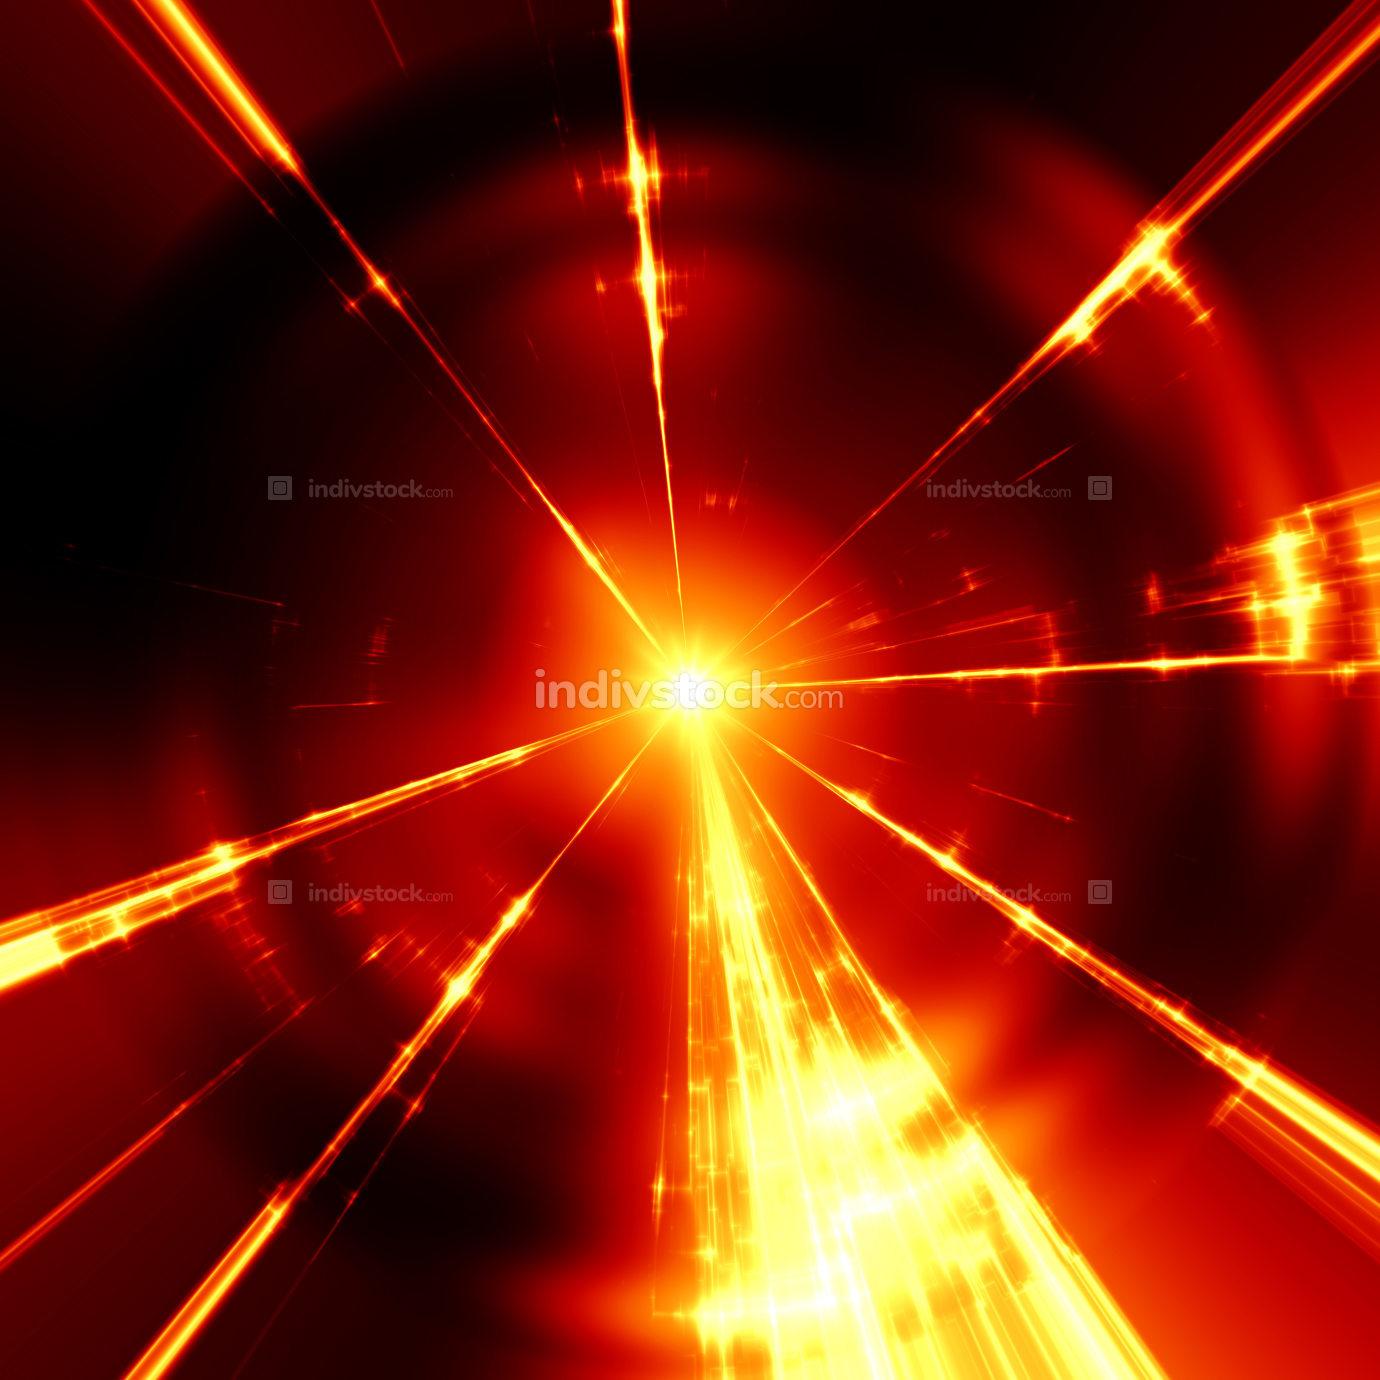 stylish red light streaks texture